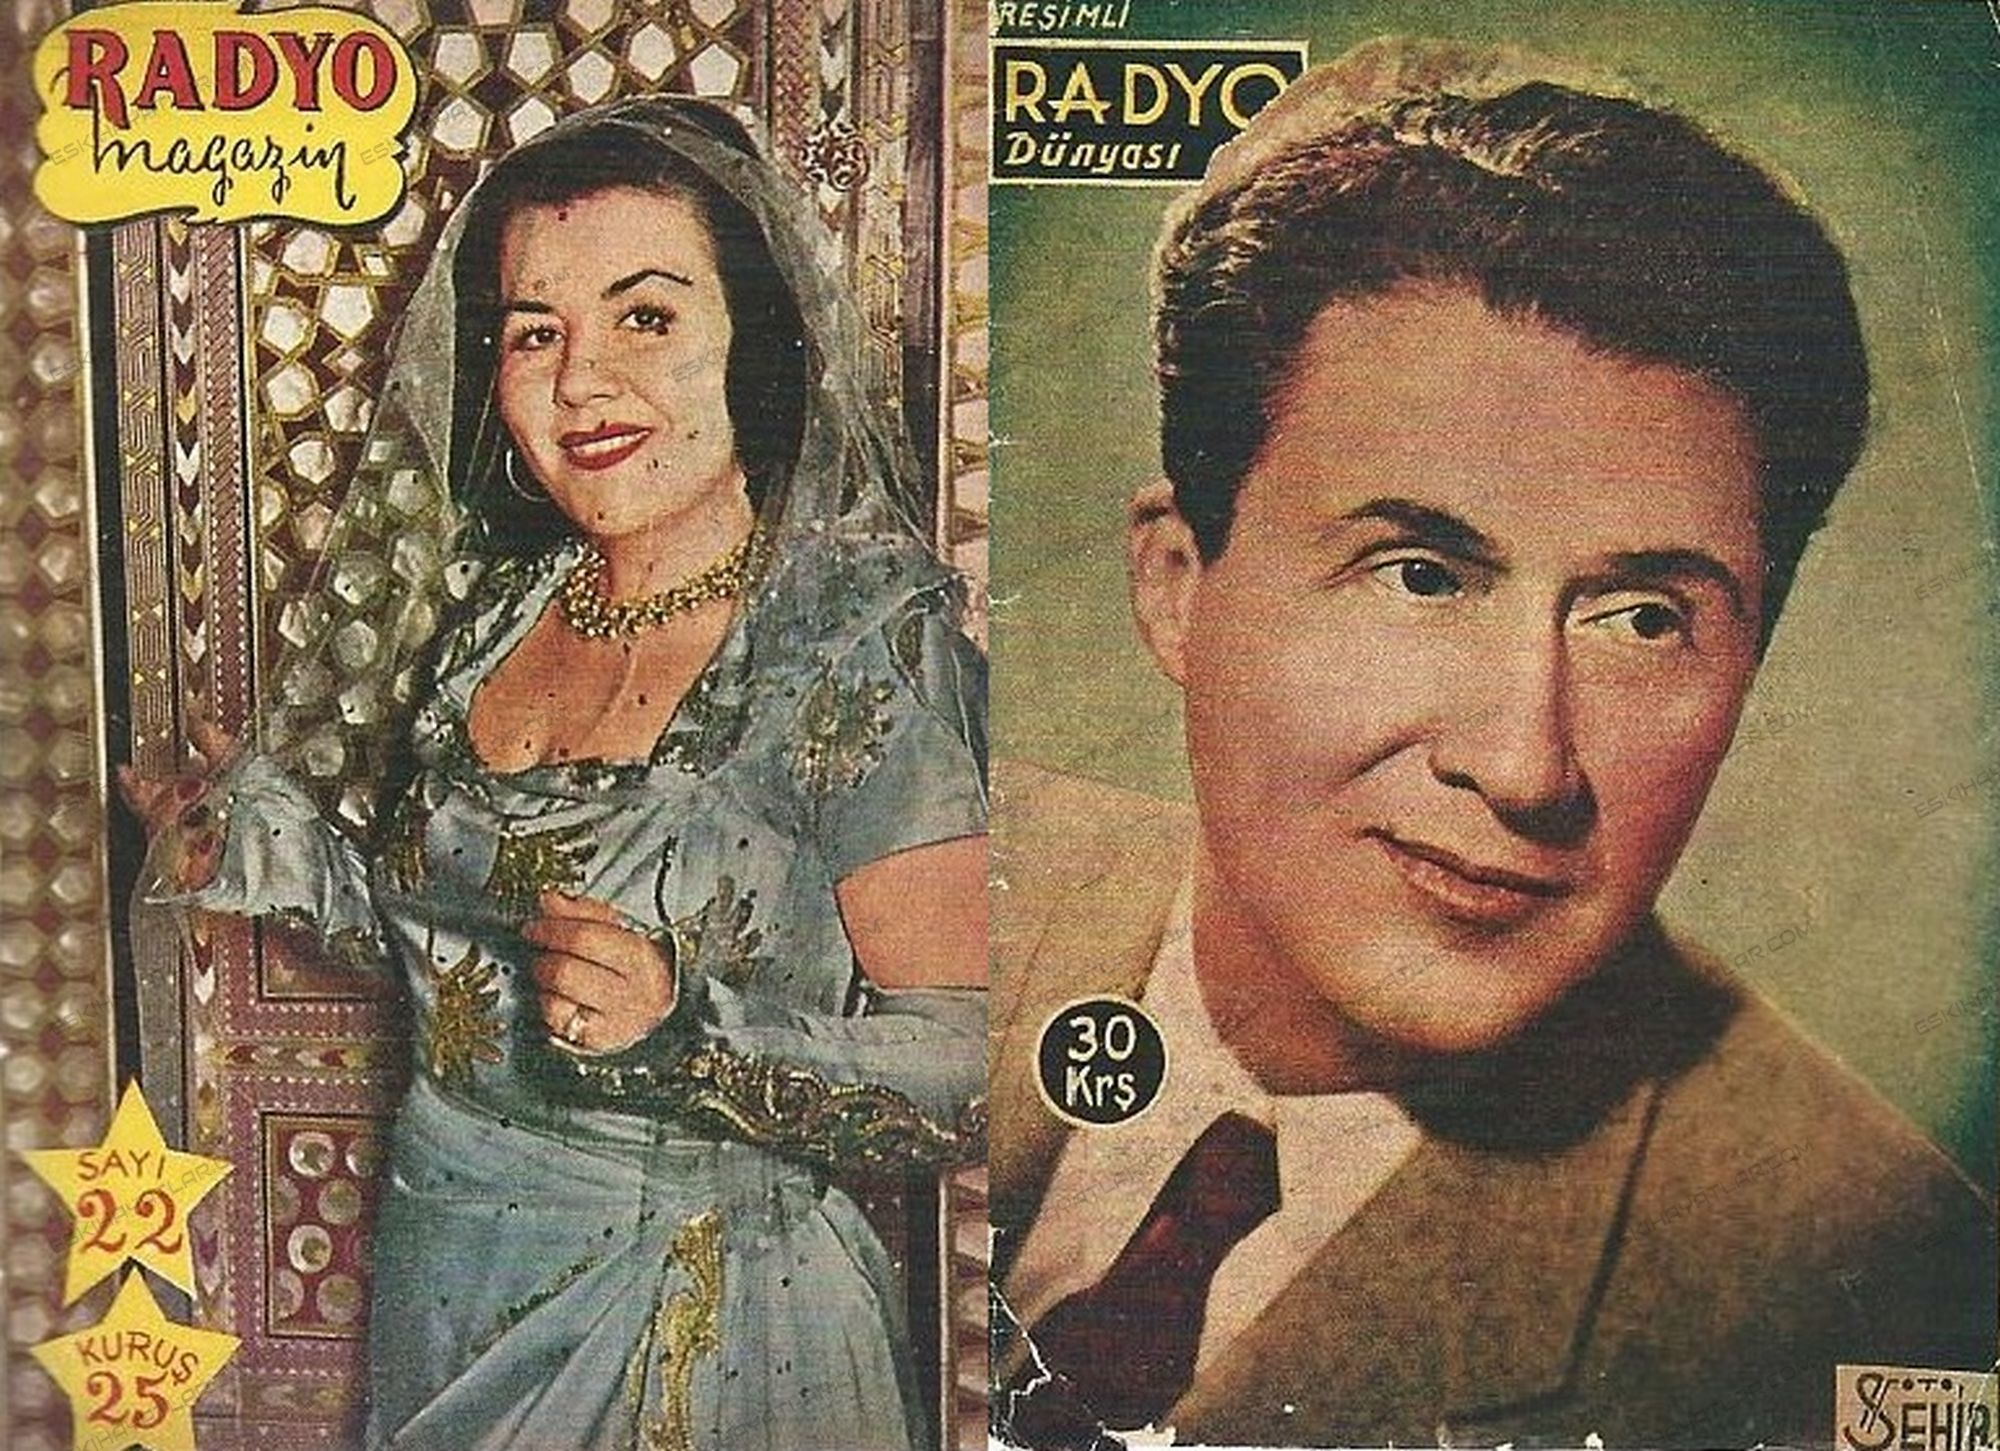 0153-radyo-magazin-dergisi-radyo-haftasi-dergisi-radyonun-sesi-dergisi-hamiyet-yuceses-yesari-asim